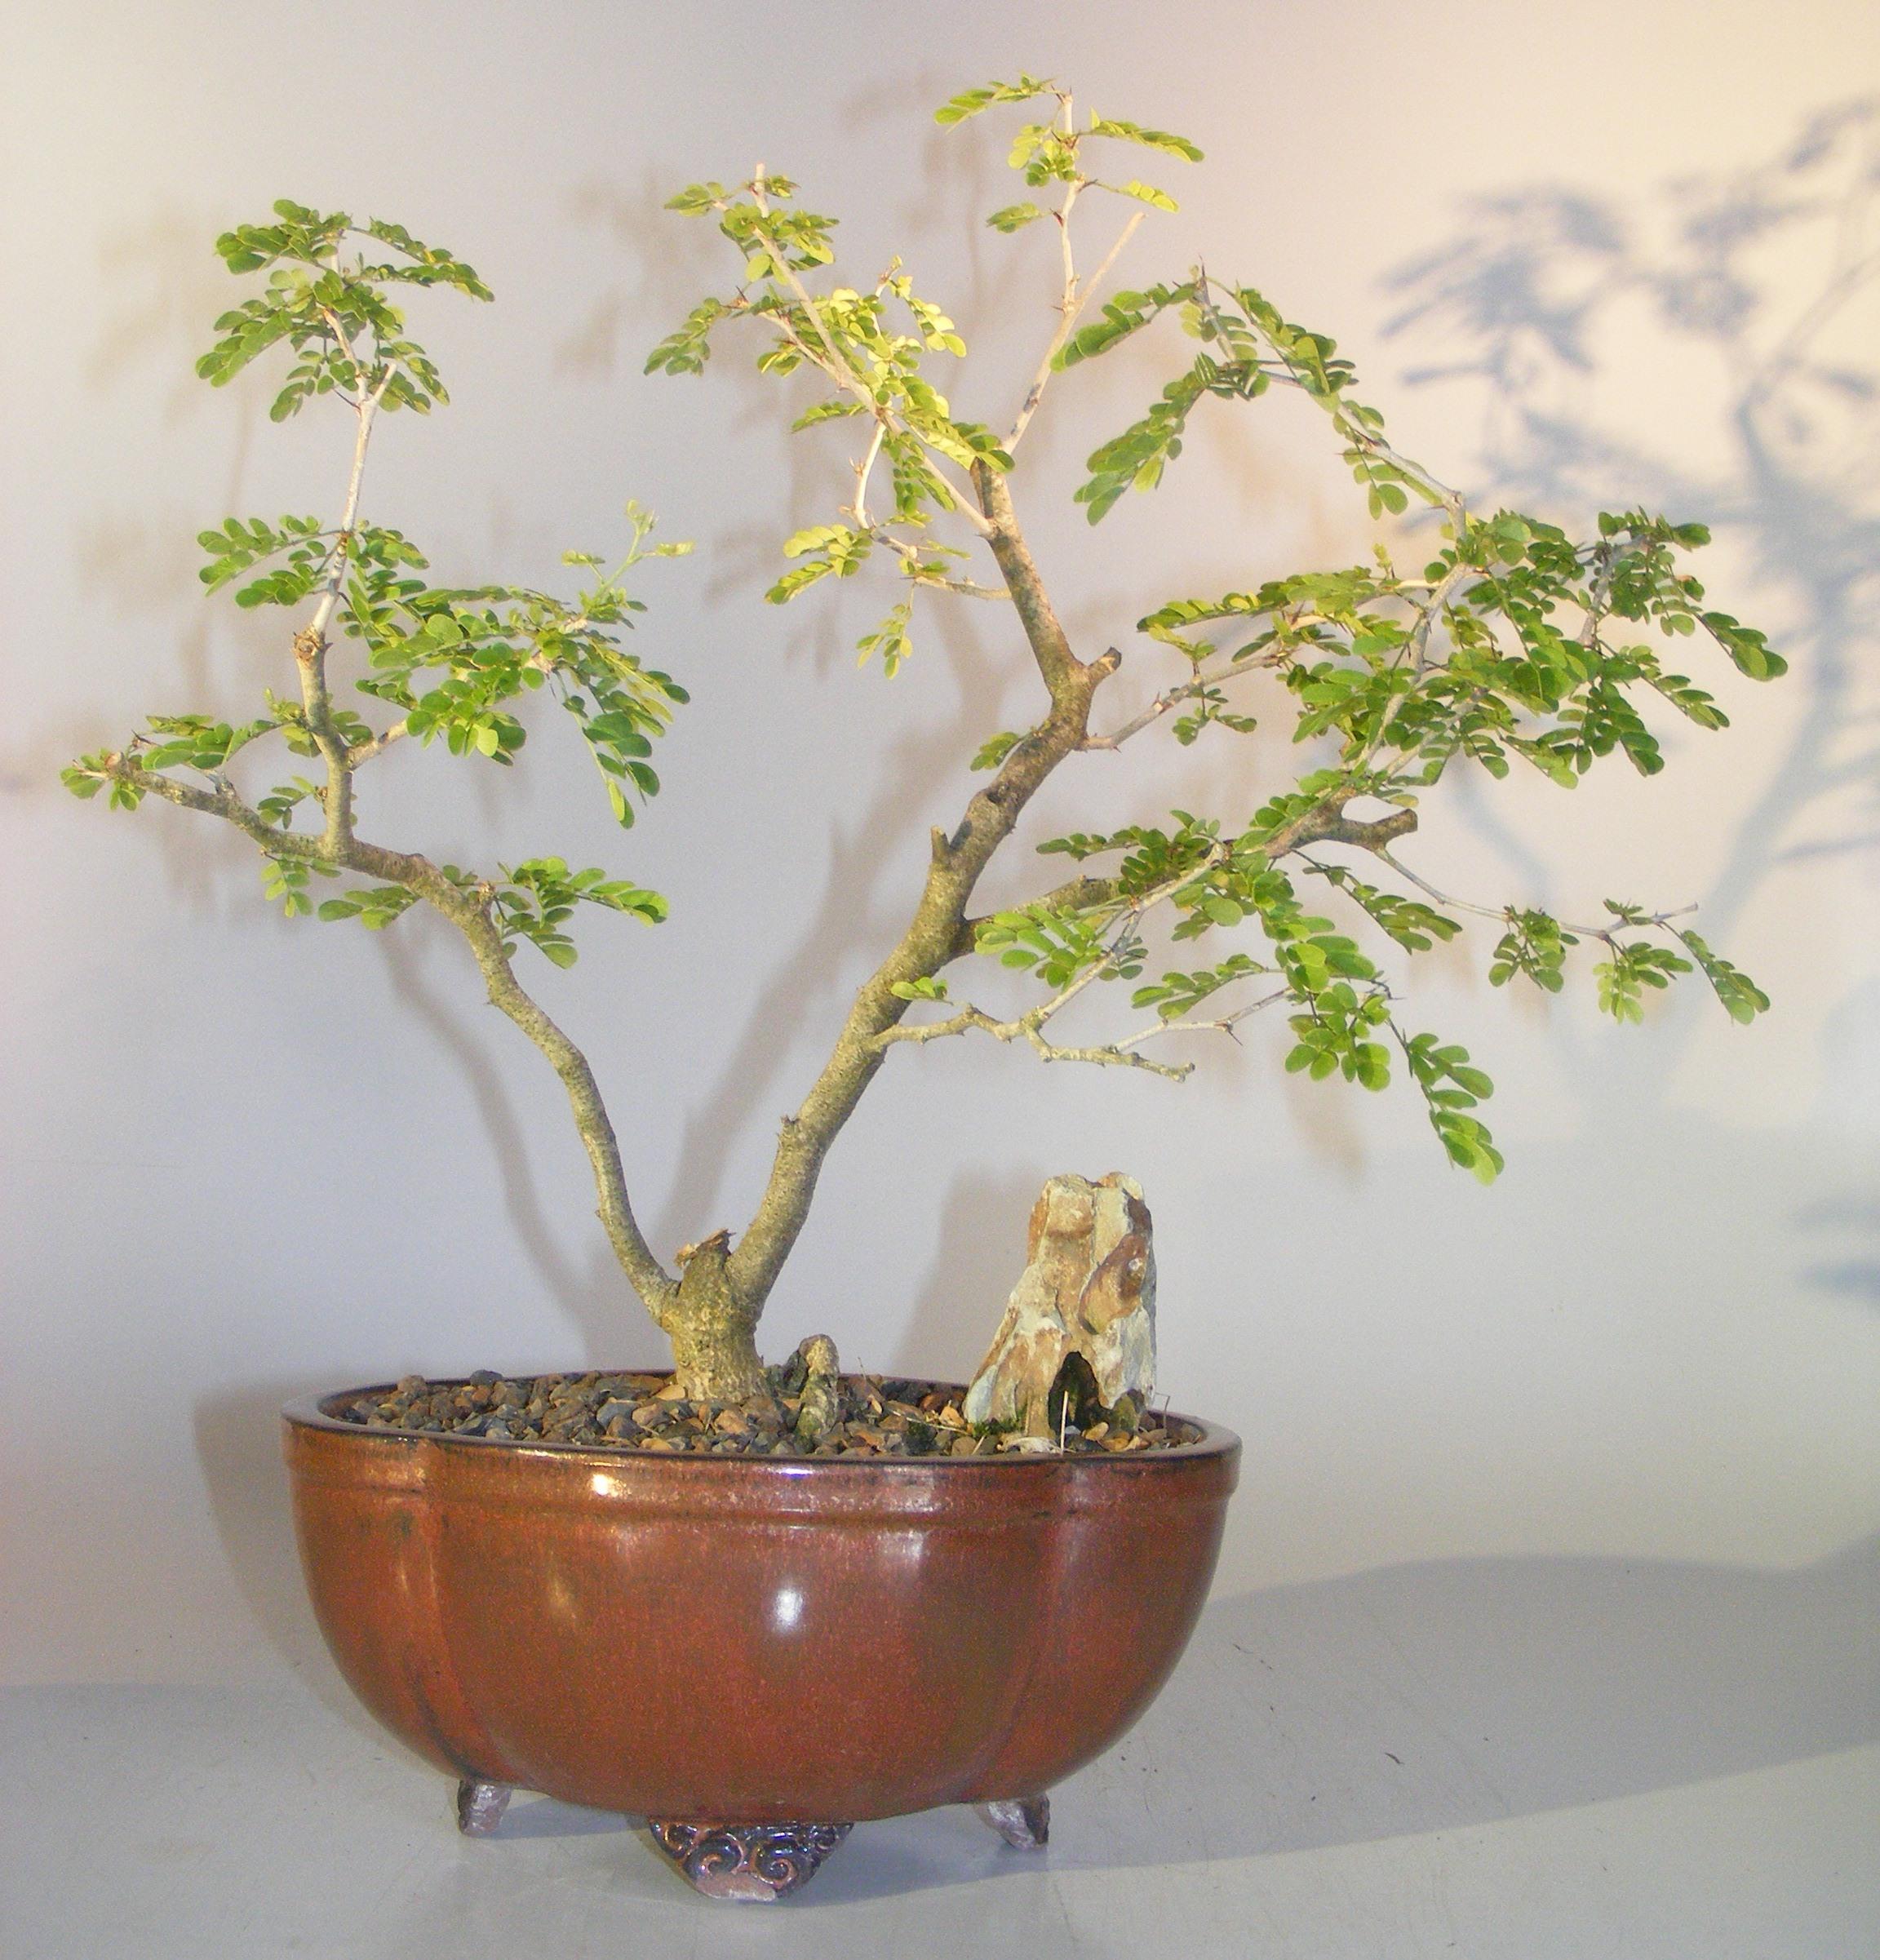 Flowering Texas Ebony Bonsai Tree Pithecolobium Flexicaule